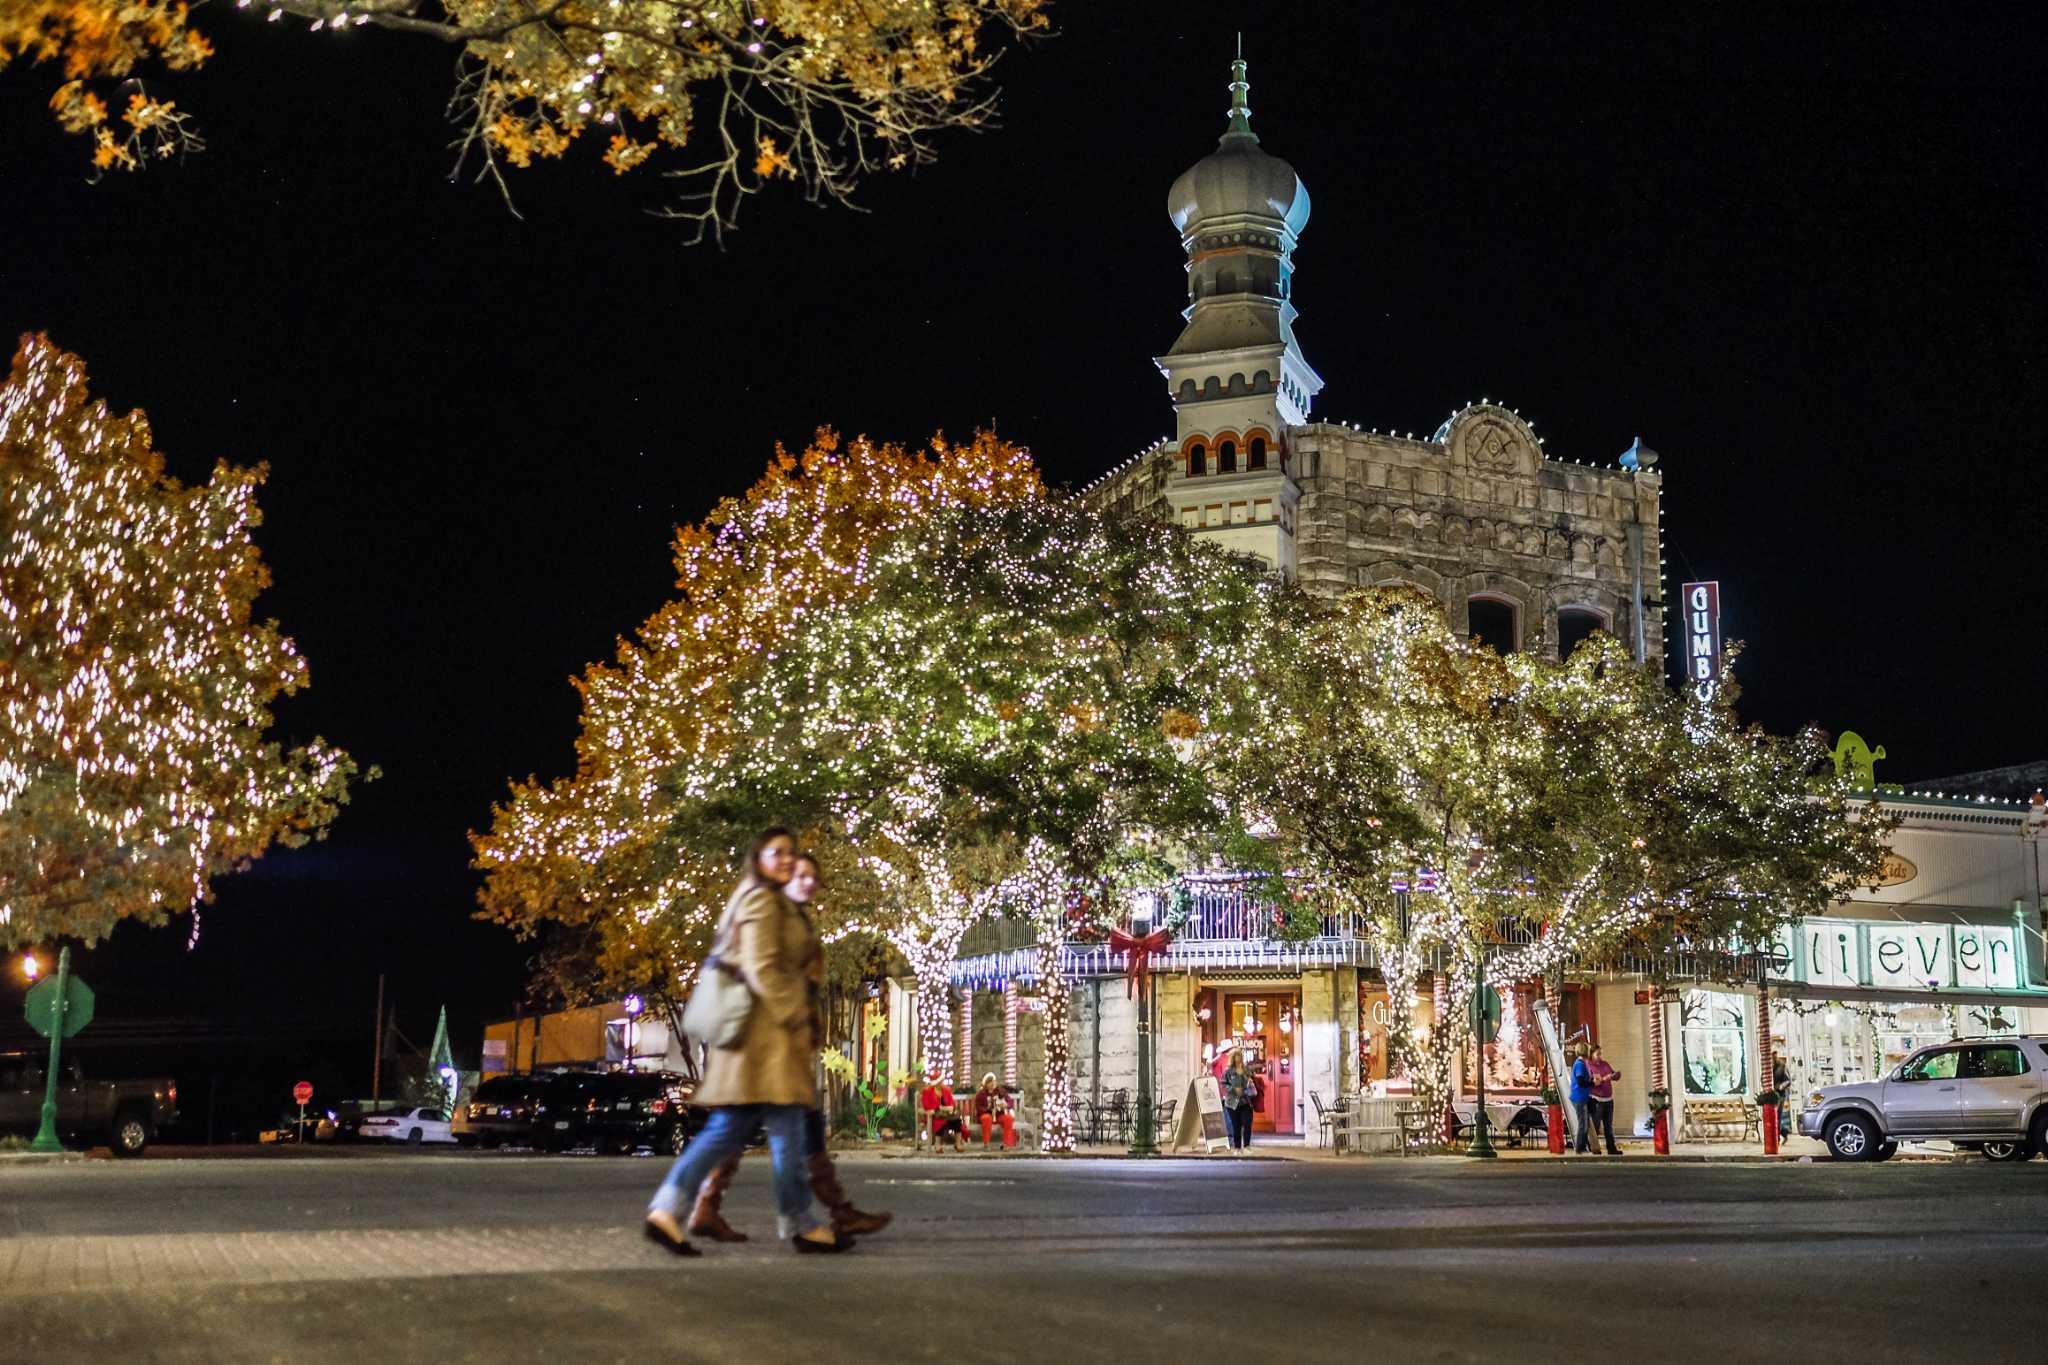 Holiday festivals and celebrations across Texas - HoustonChronicle.com